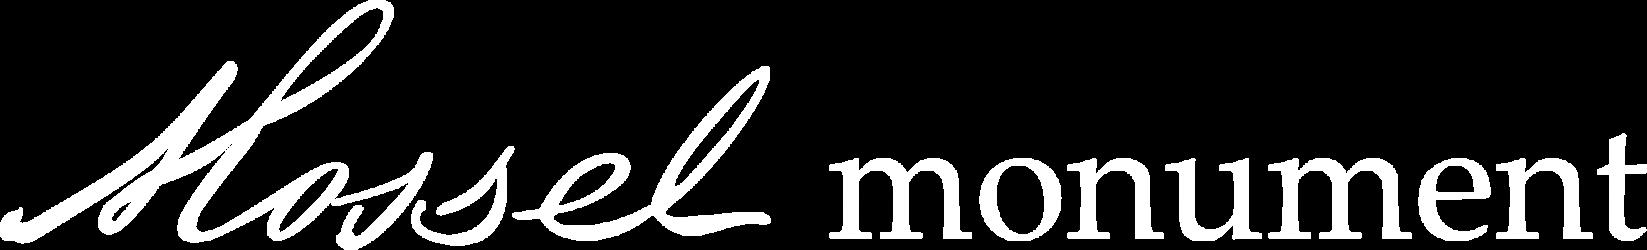 Mosselmonument